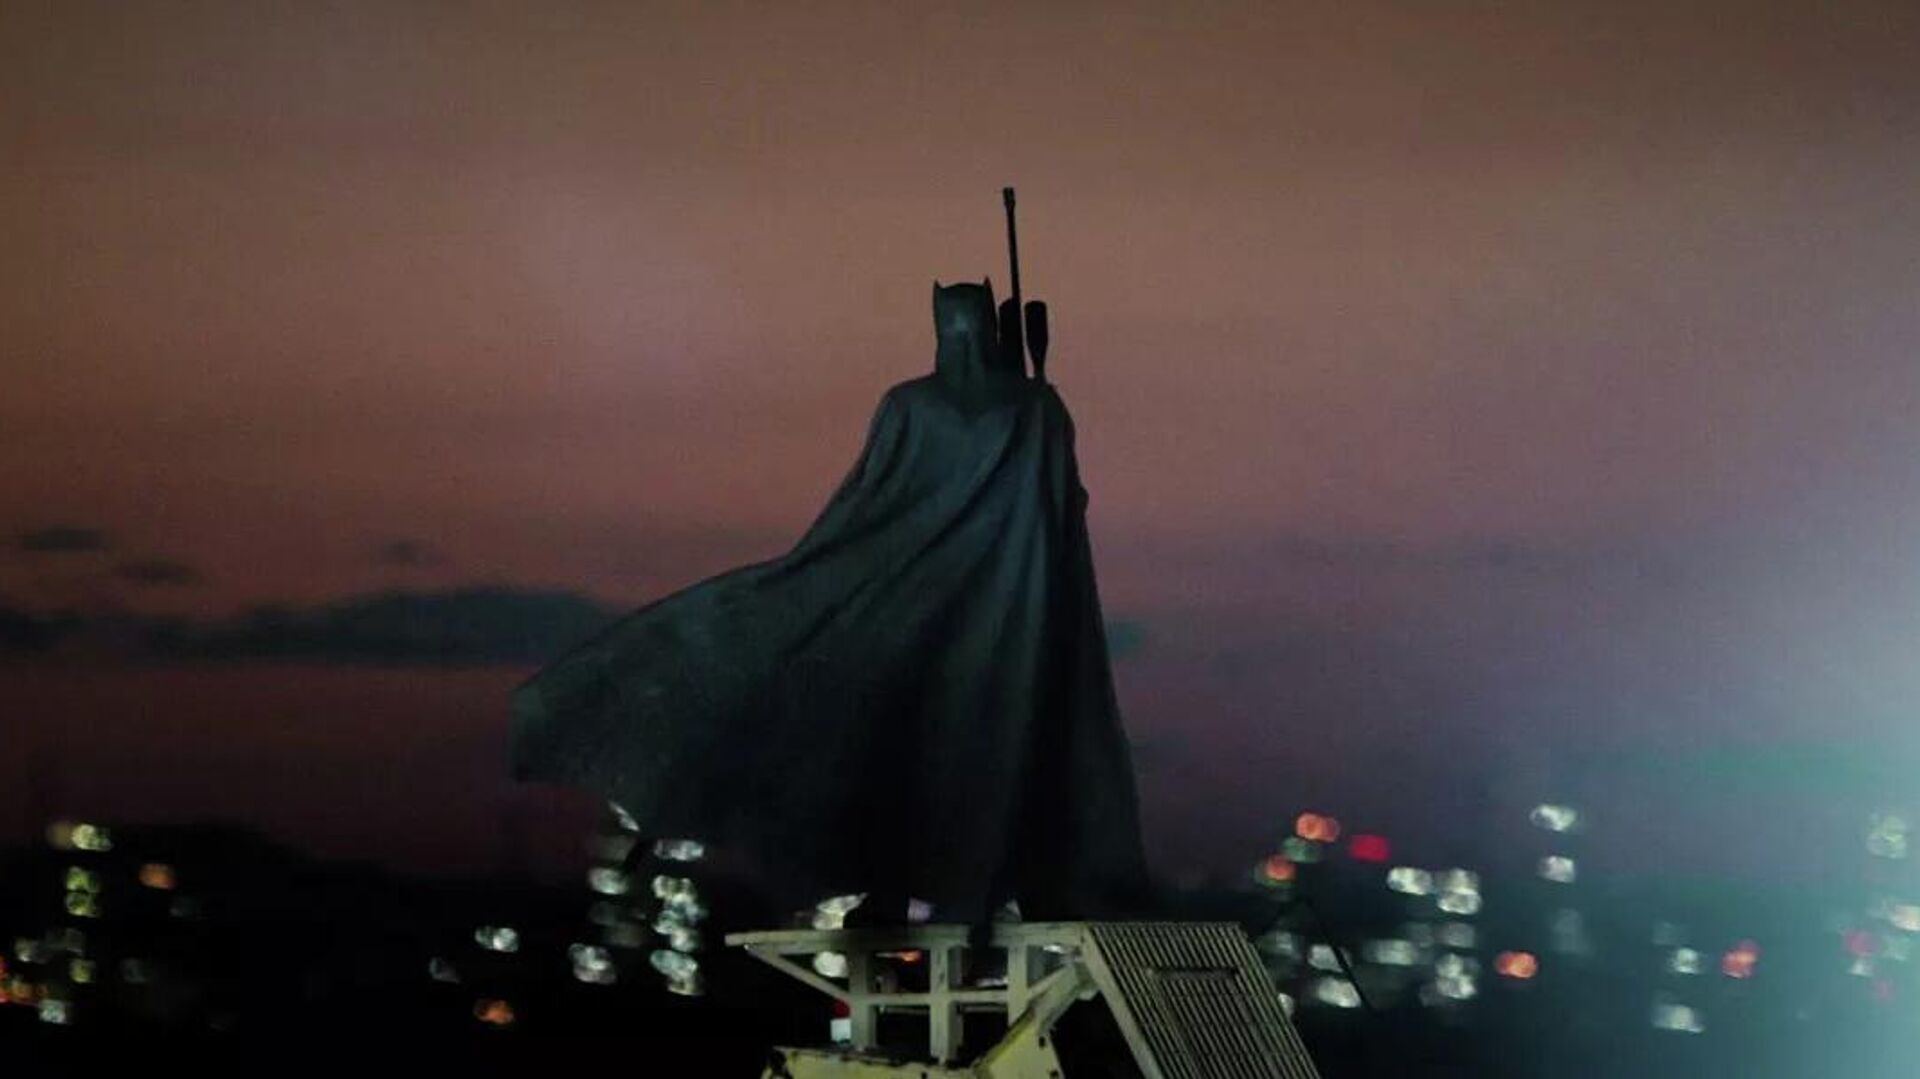 Кадр из фильма Бэтмен против Супермена: На заре справедливости - Sputnik Таджикистан, 1920, 12.08.2021